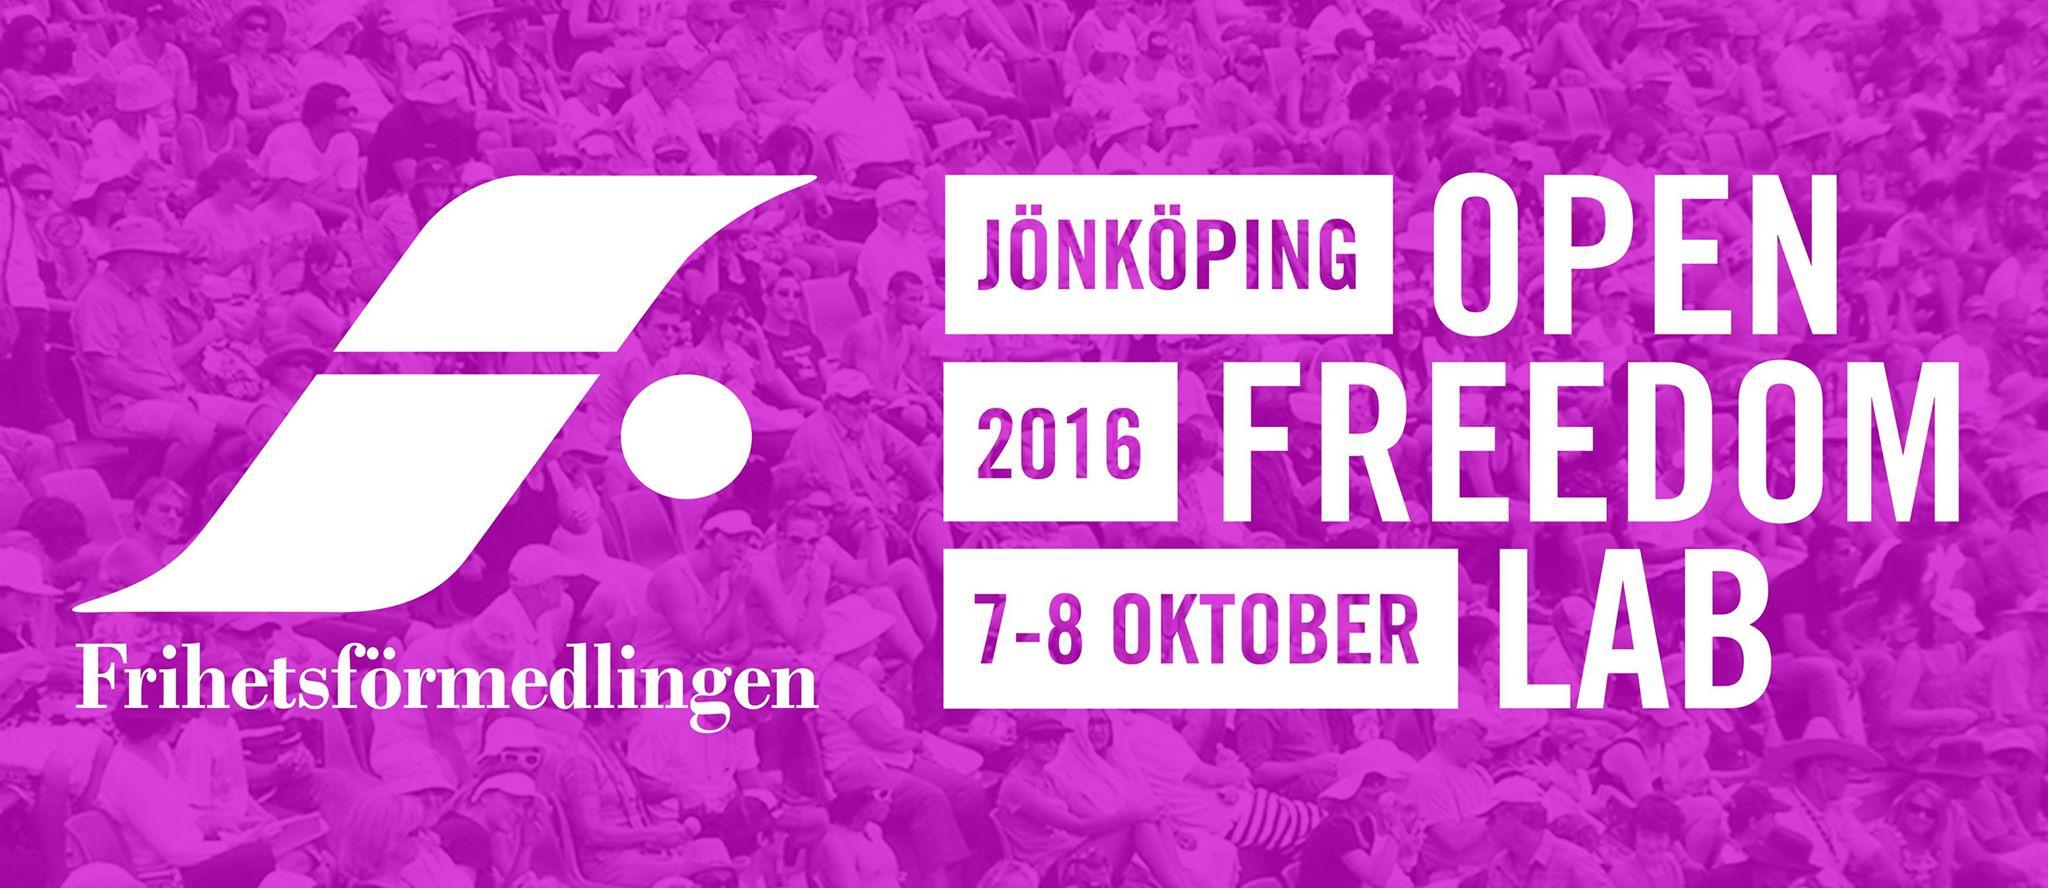 ÖK Arena: OPEN FREEDOM LAB 2016